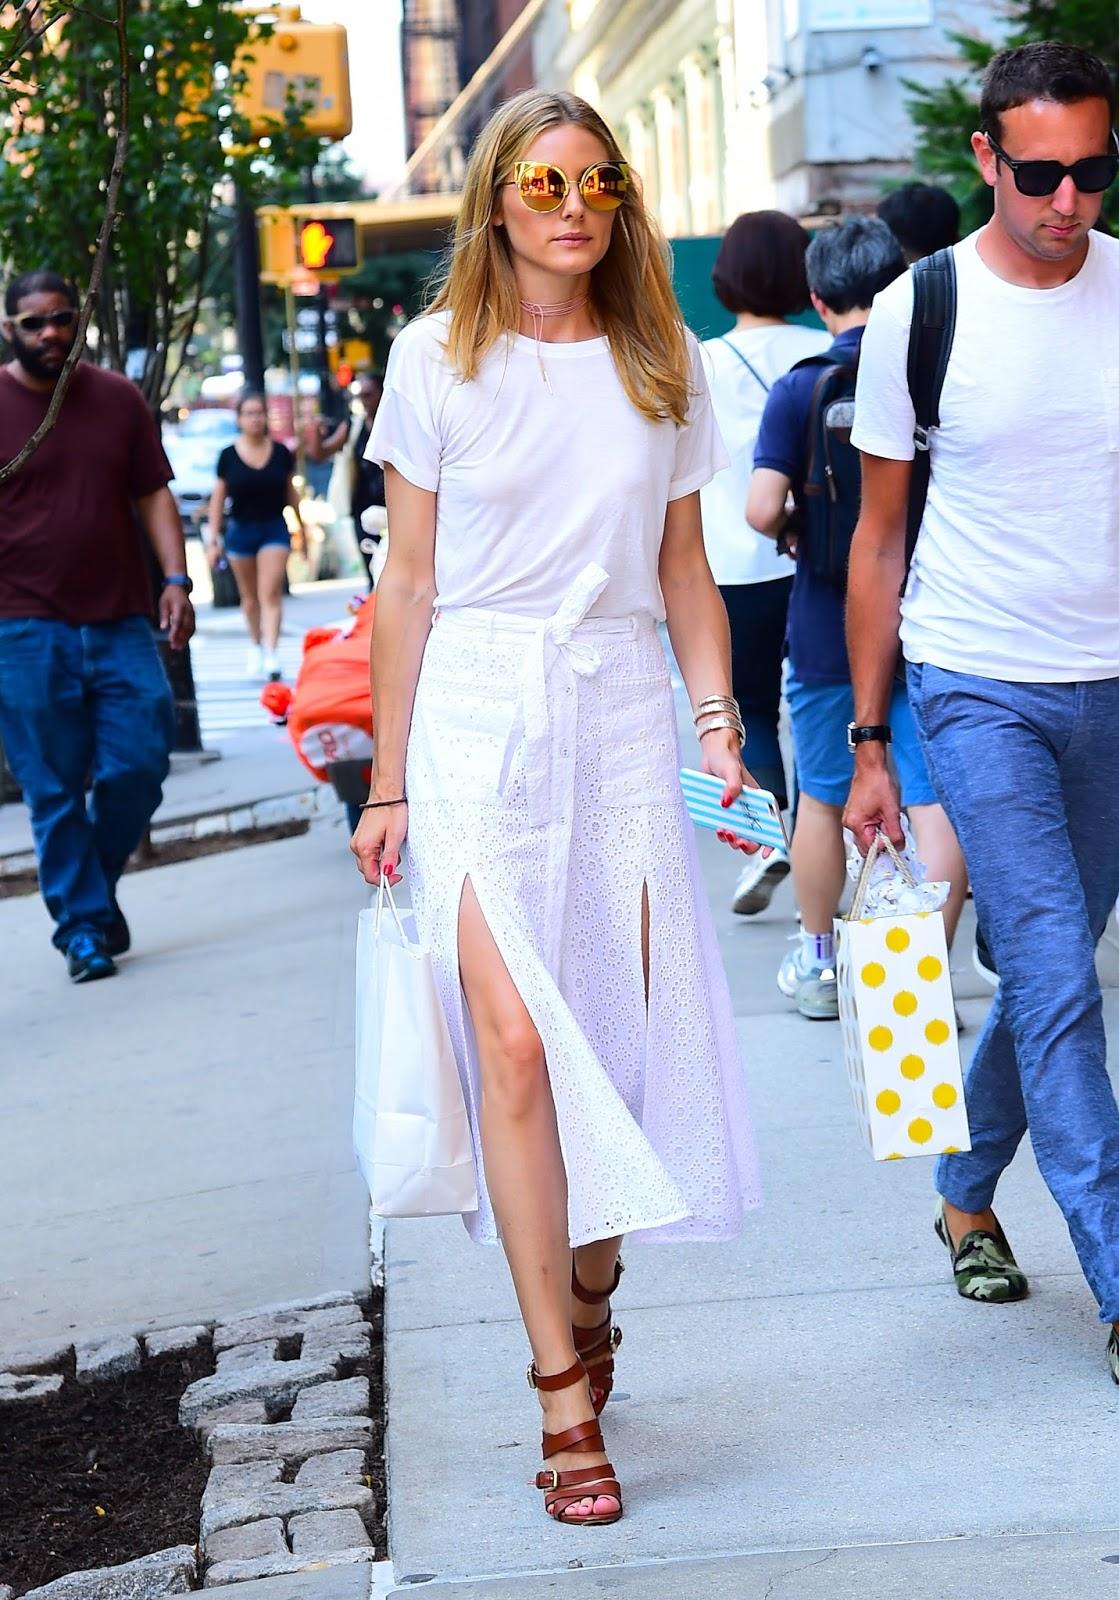 Olivia-Palermo-White-Slit-Skirt-July-2016-2